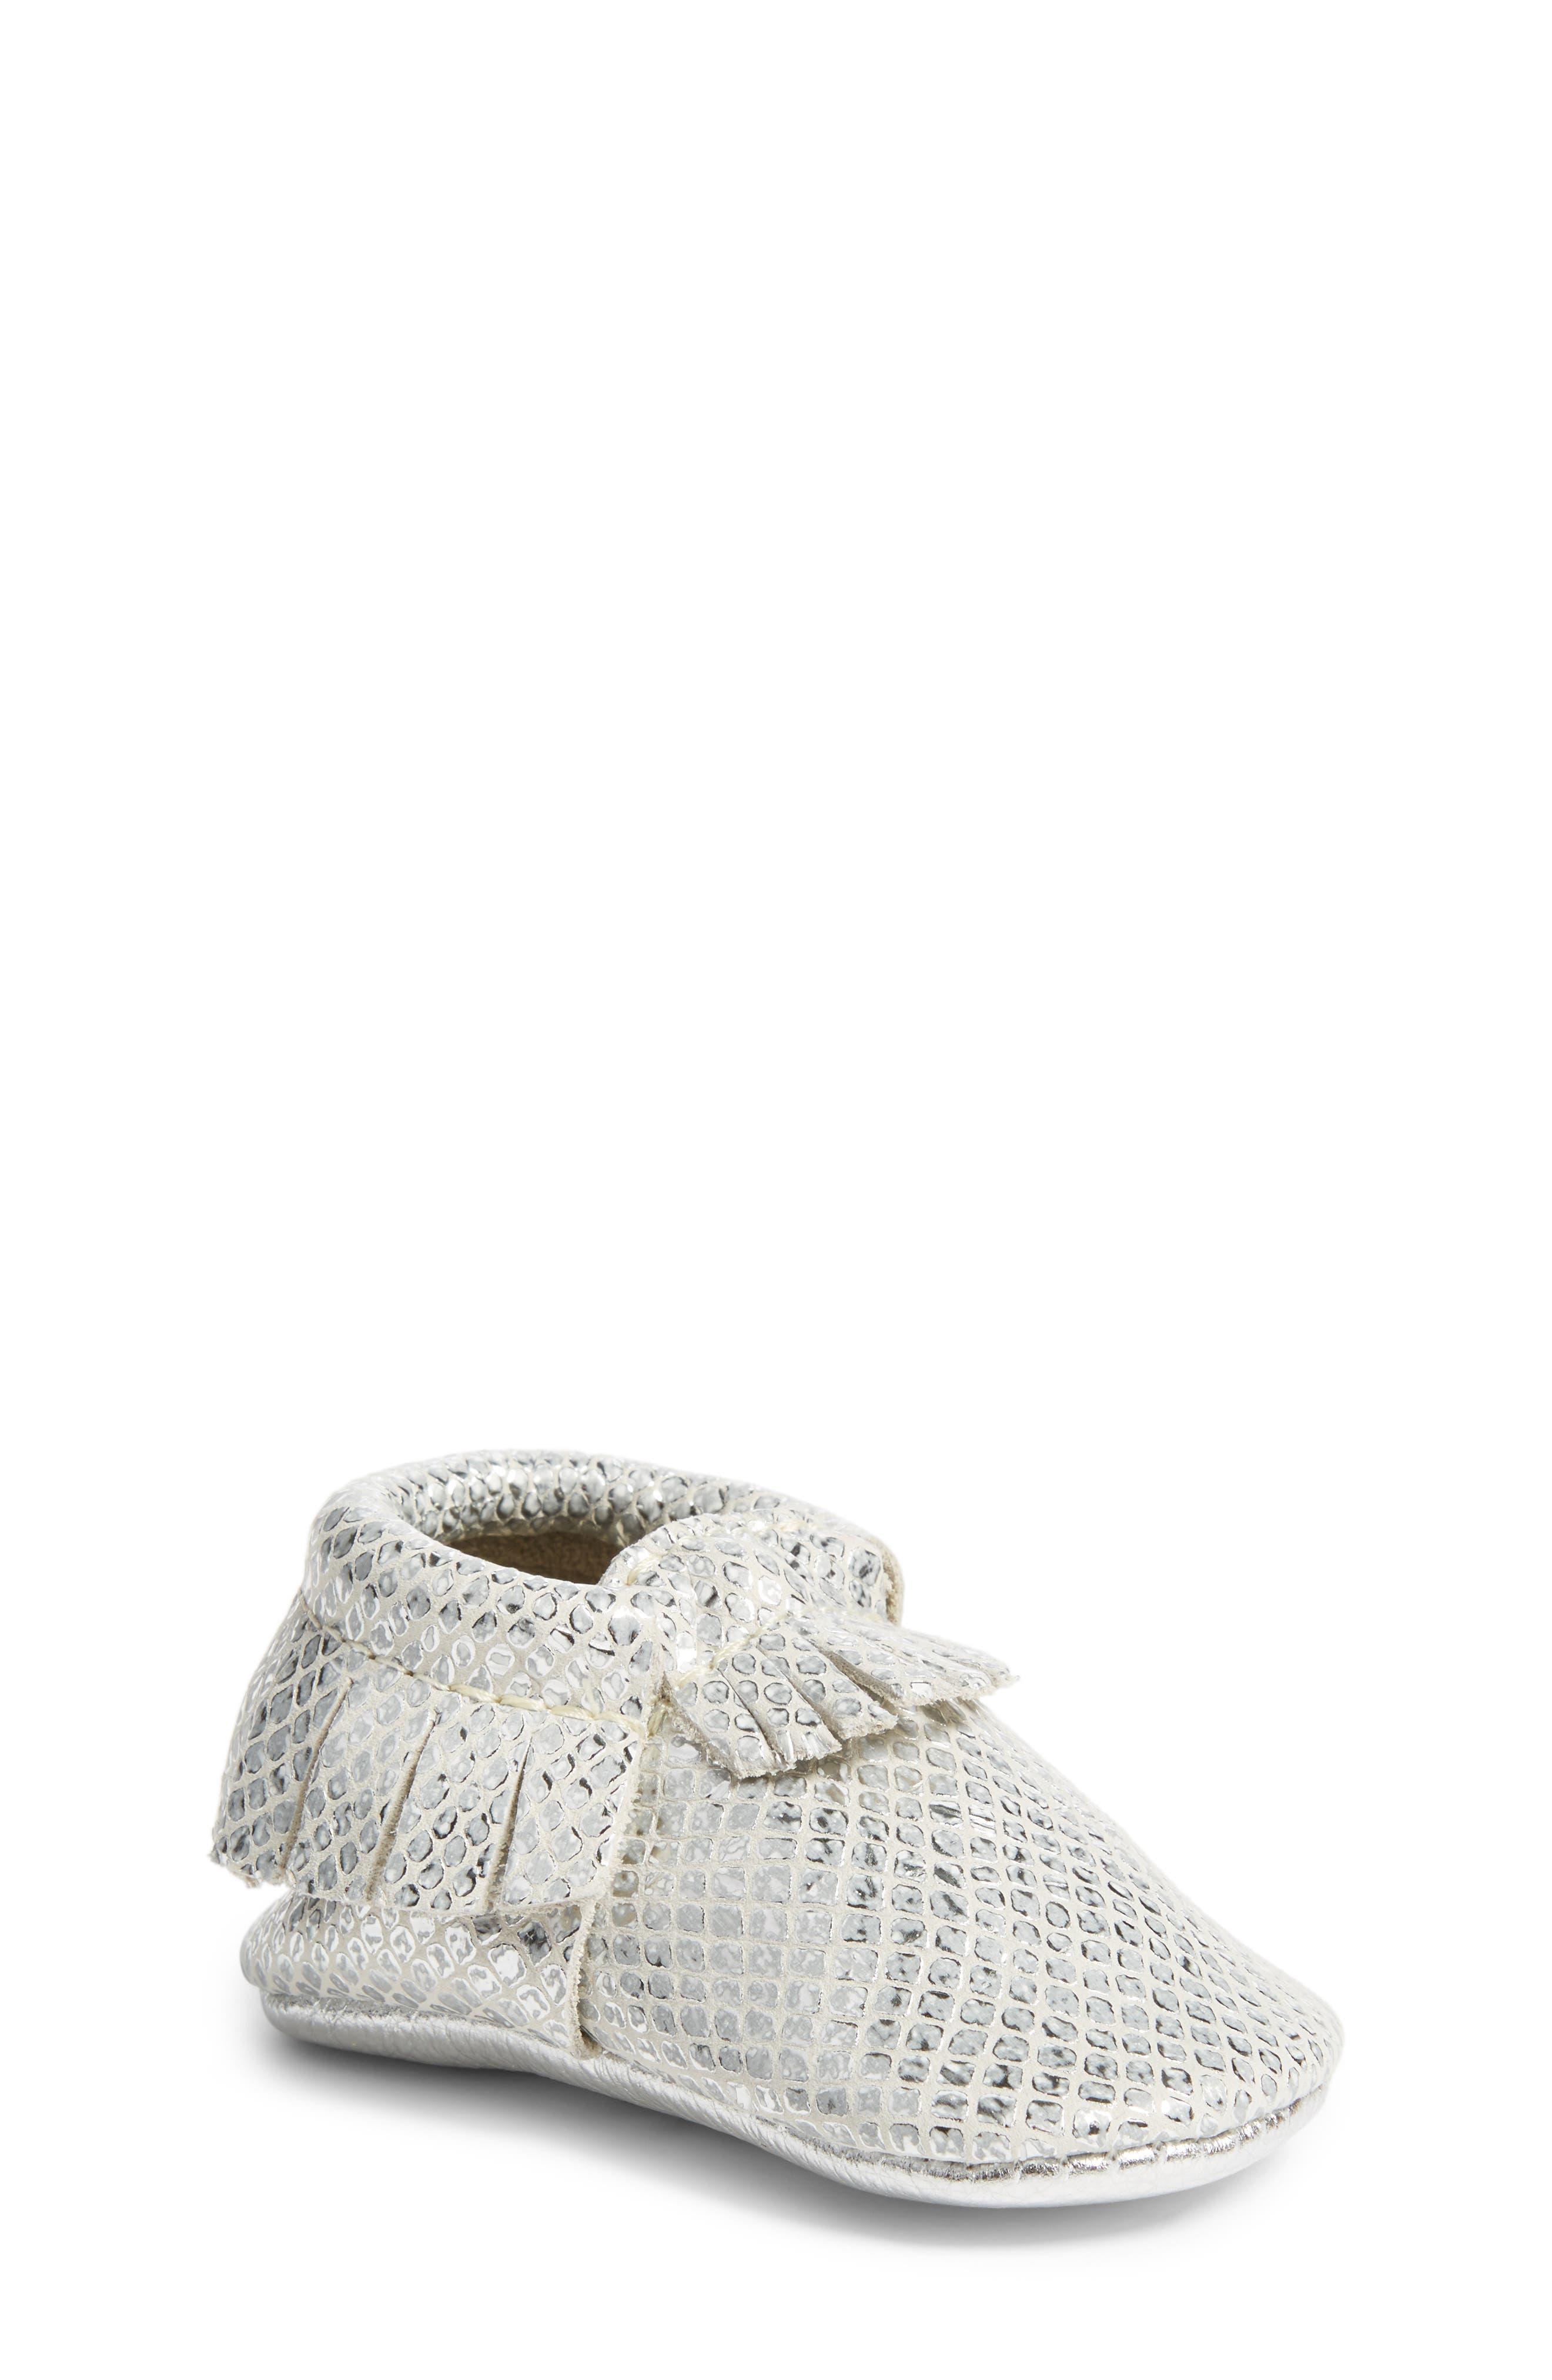 Alternate Image 1 Selected - Freshly Picked Fashion Week Mocassin (Baby & Walker)